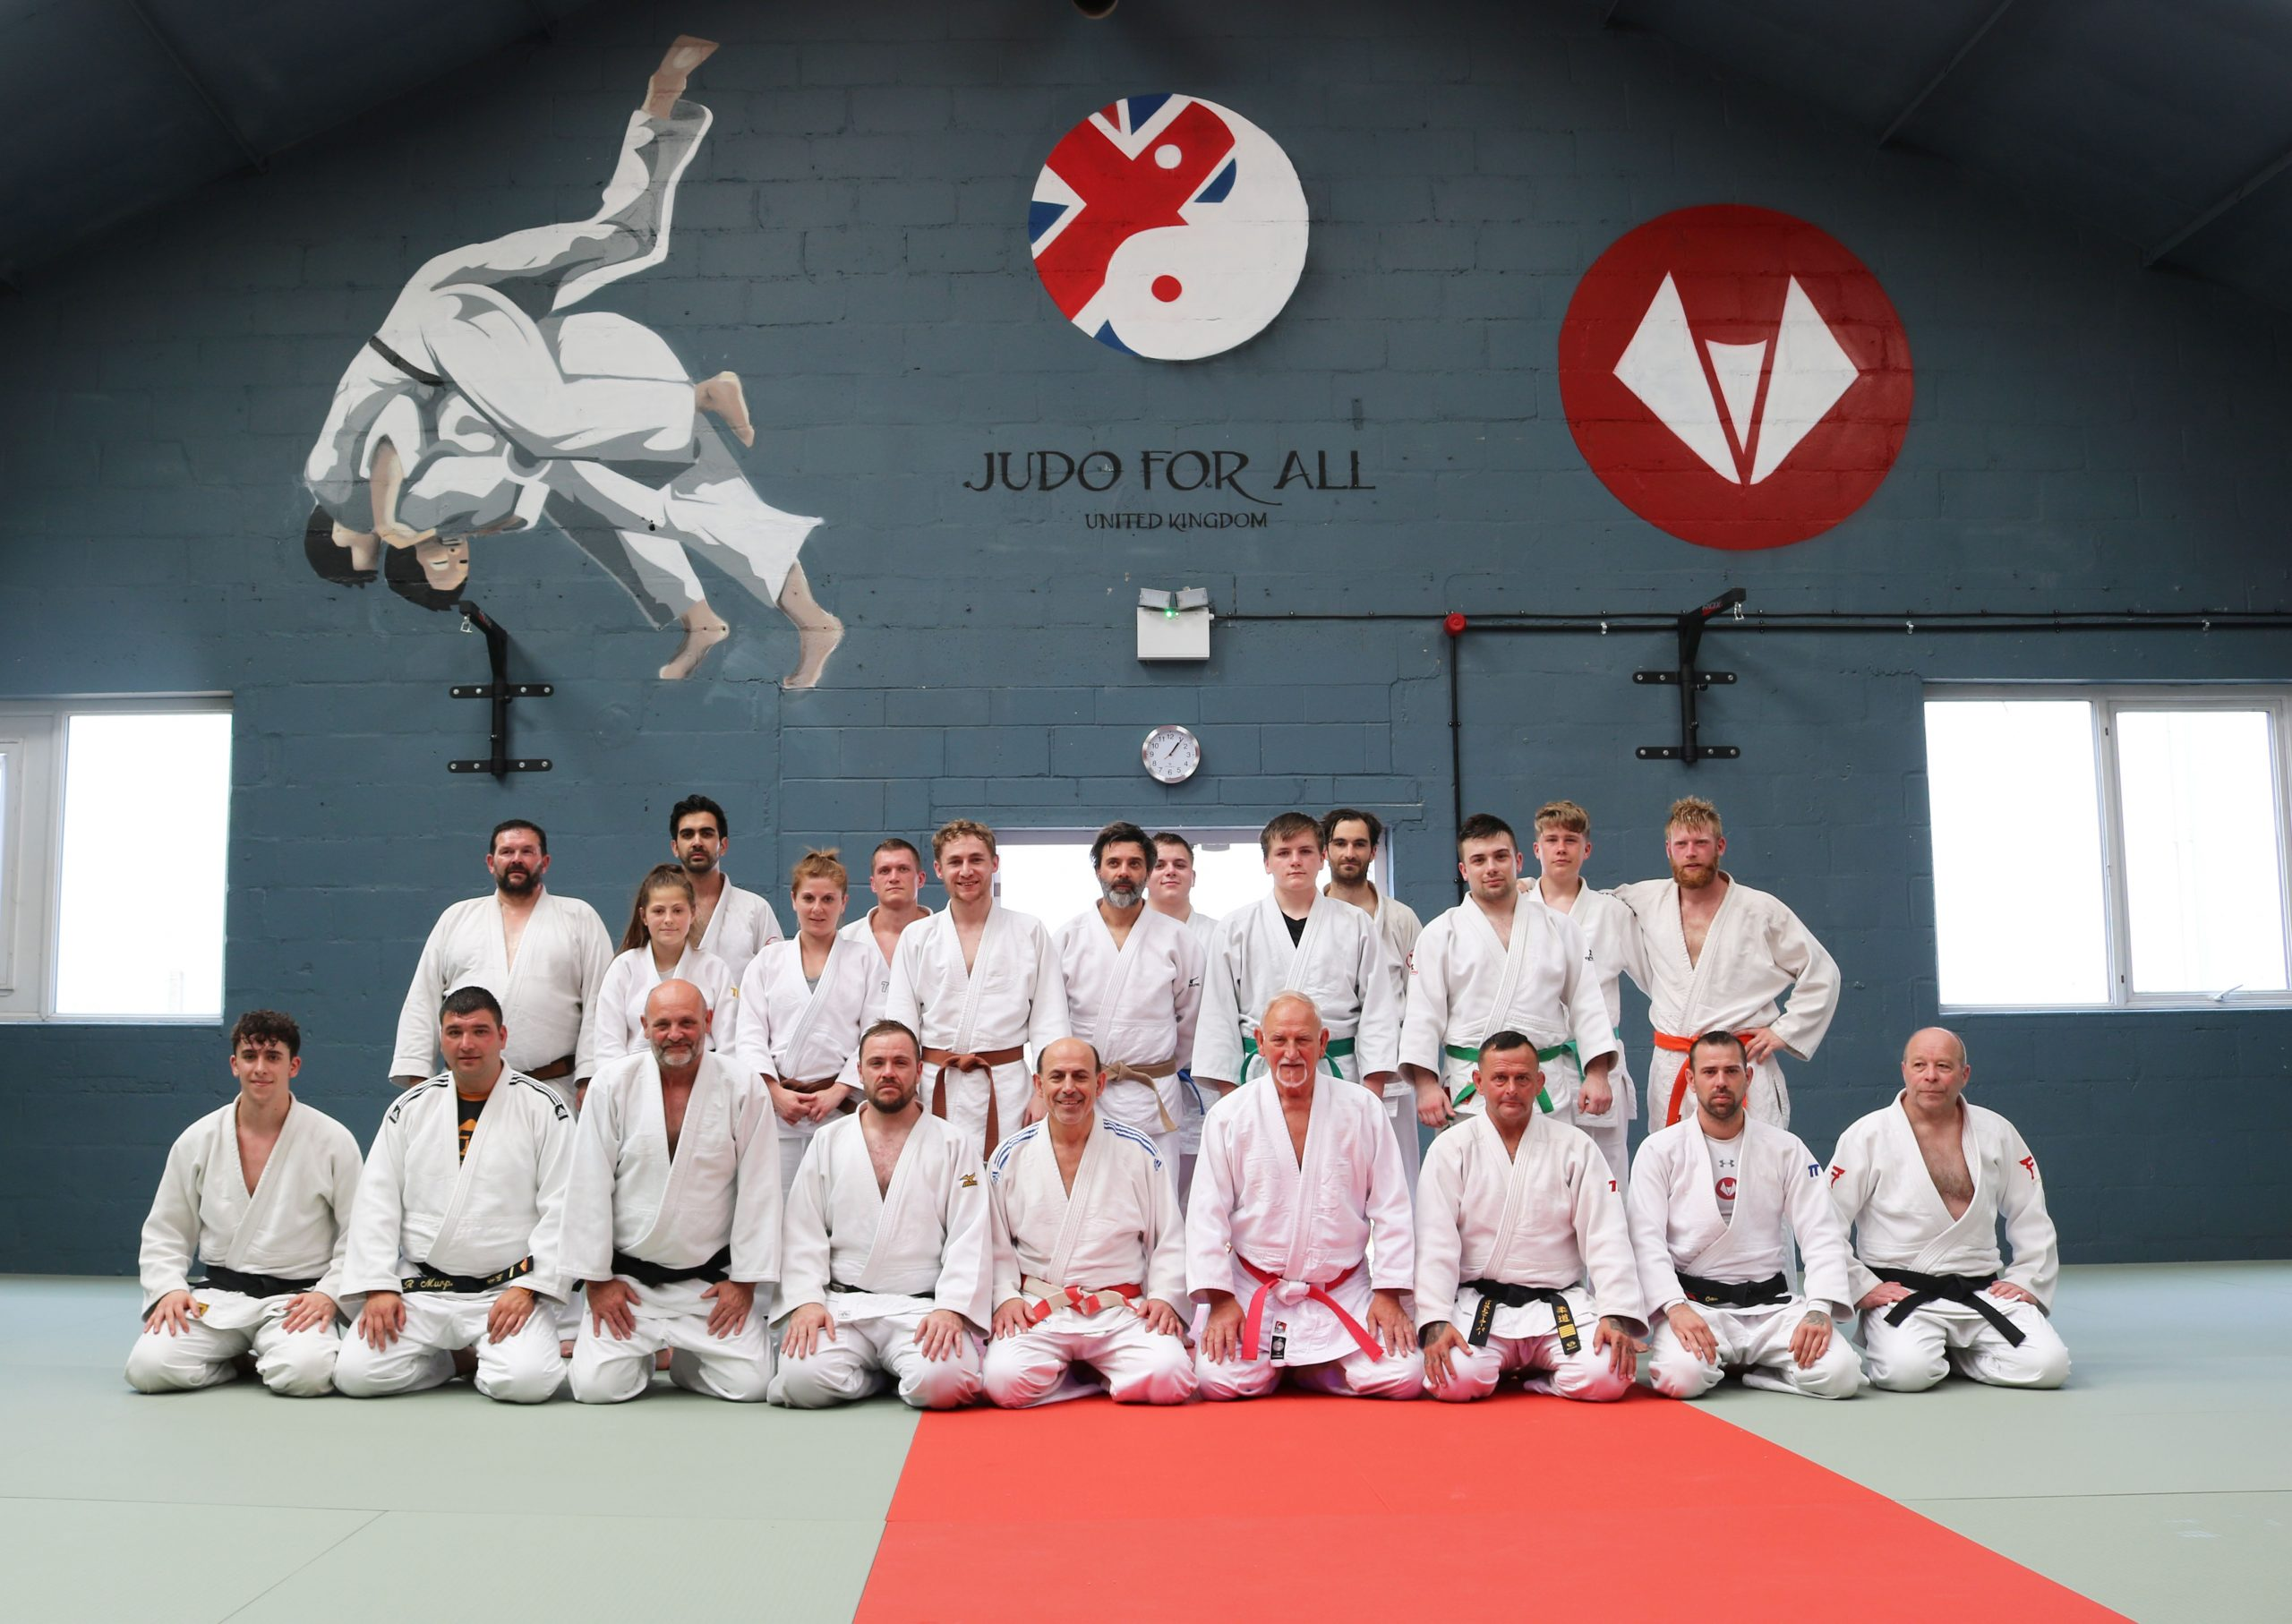 Club Judoka Worthing